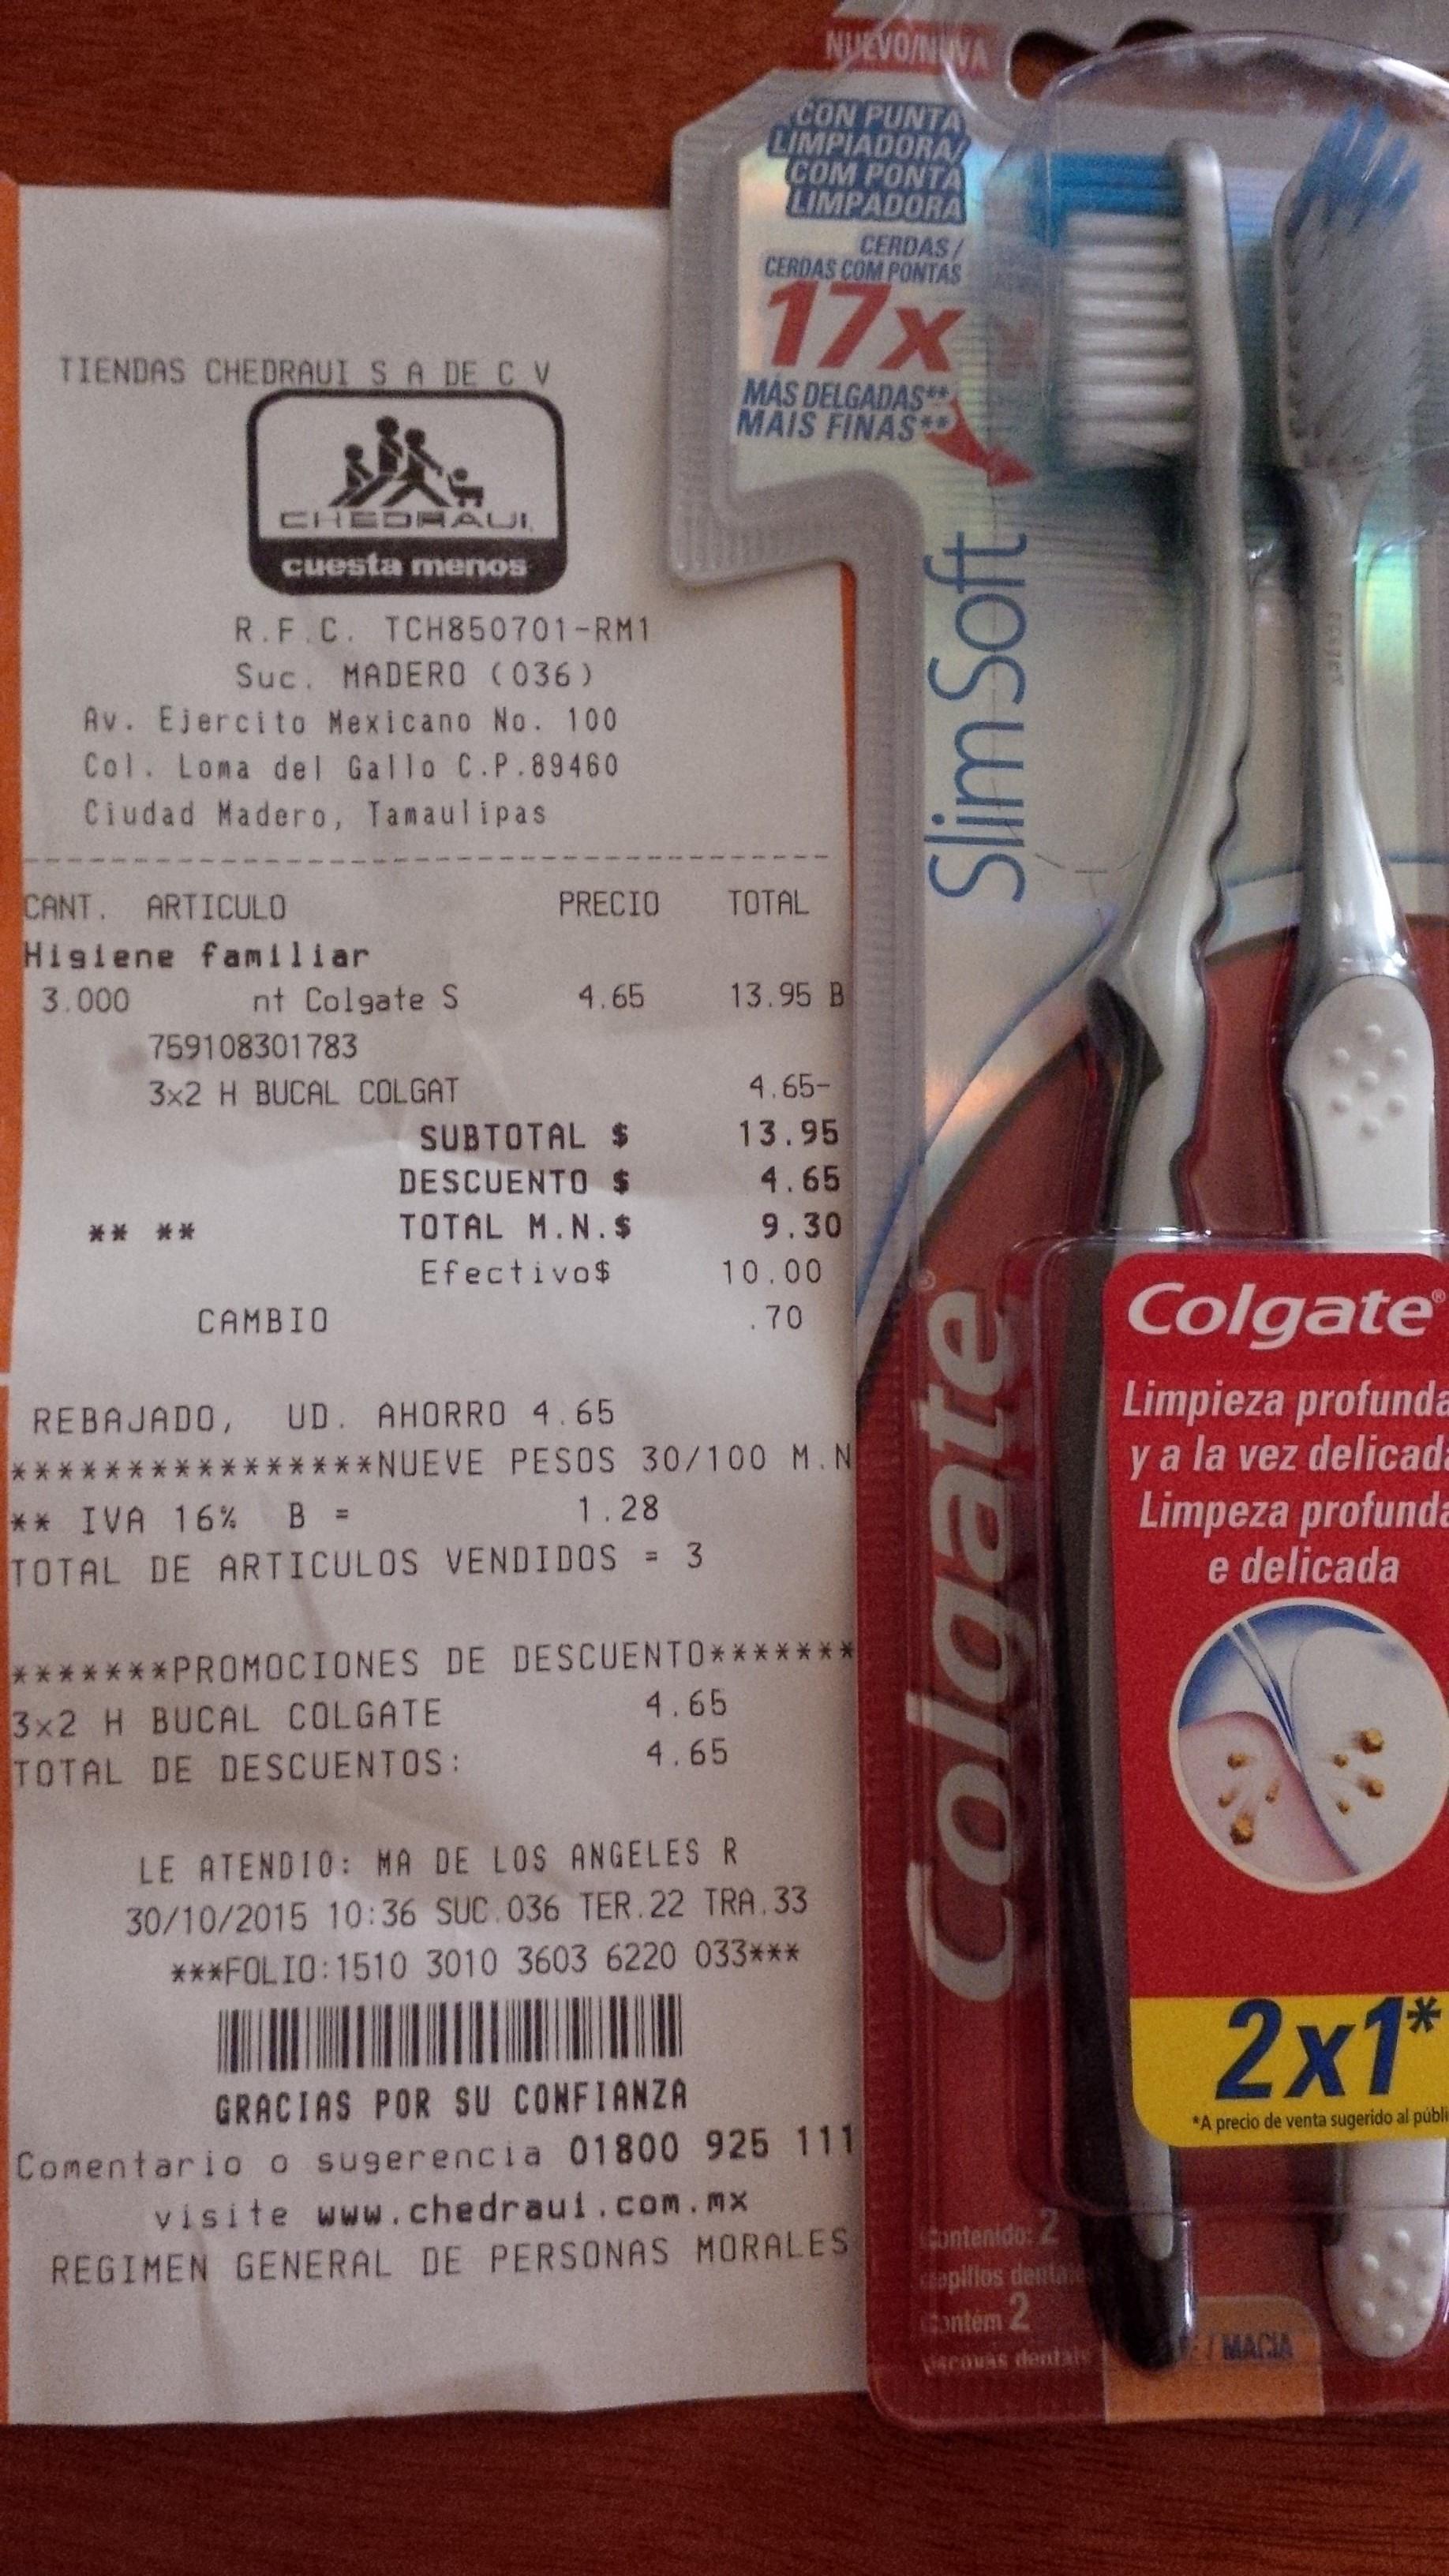 Chedraui: Cepillo Colgate slim soft 2 pack